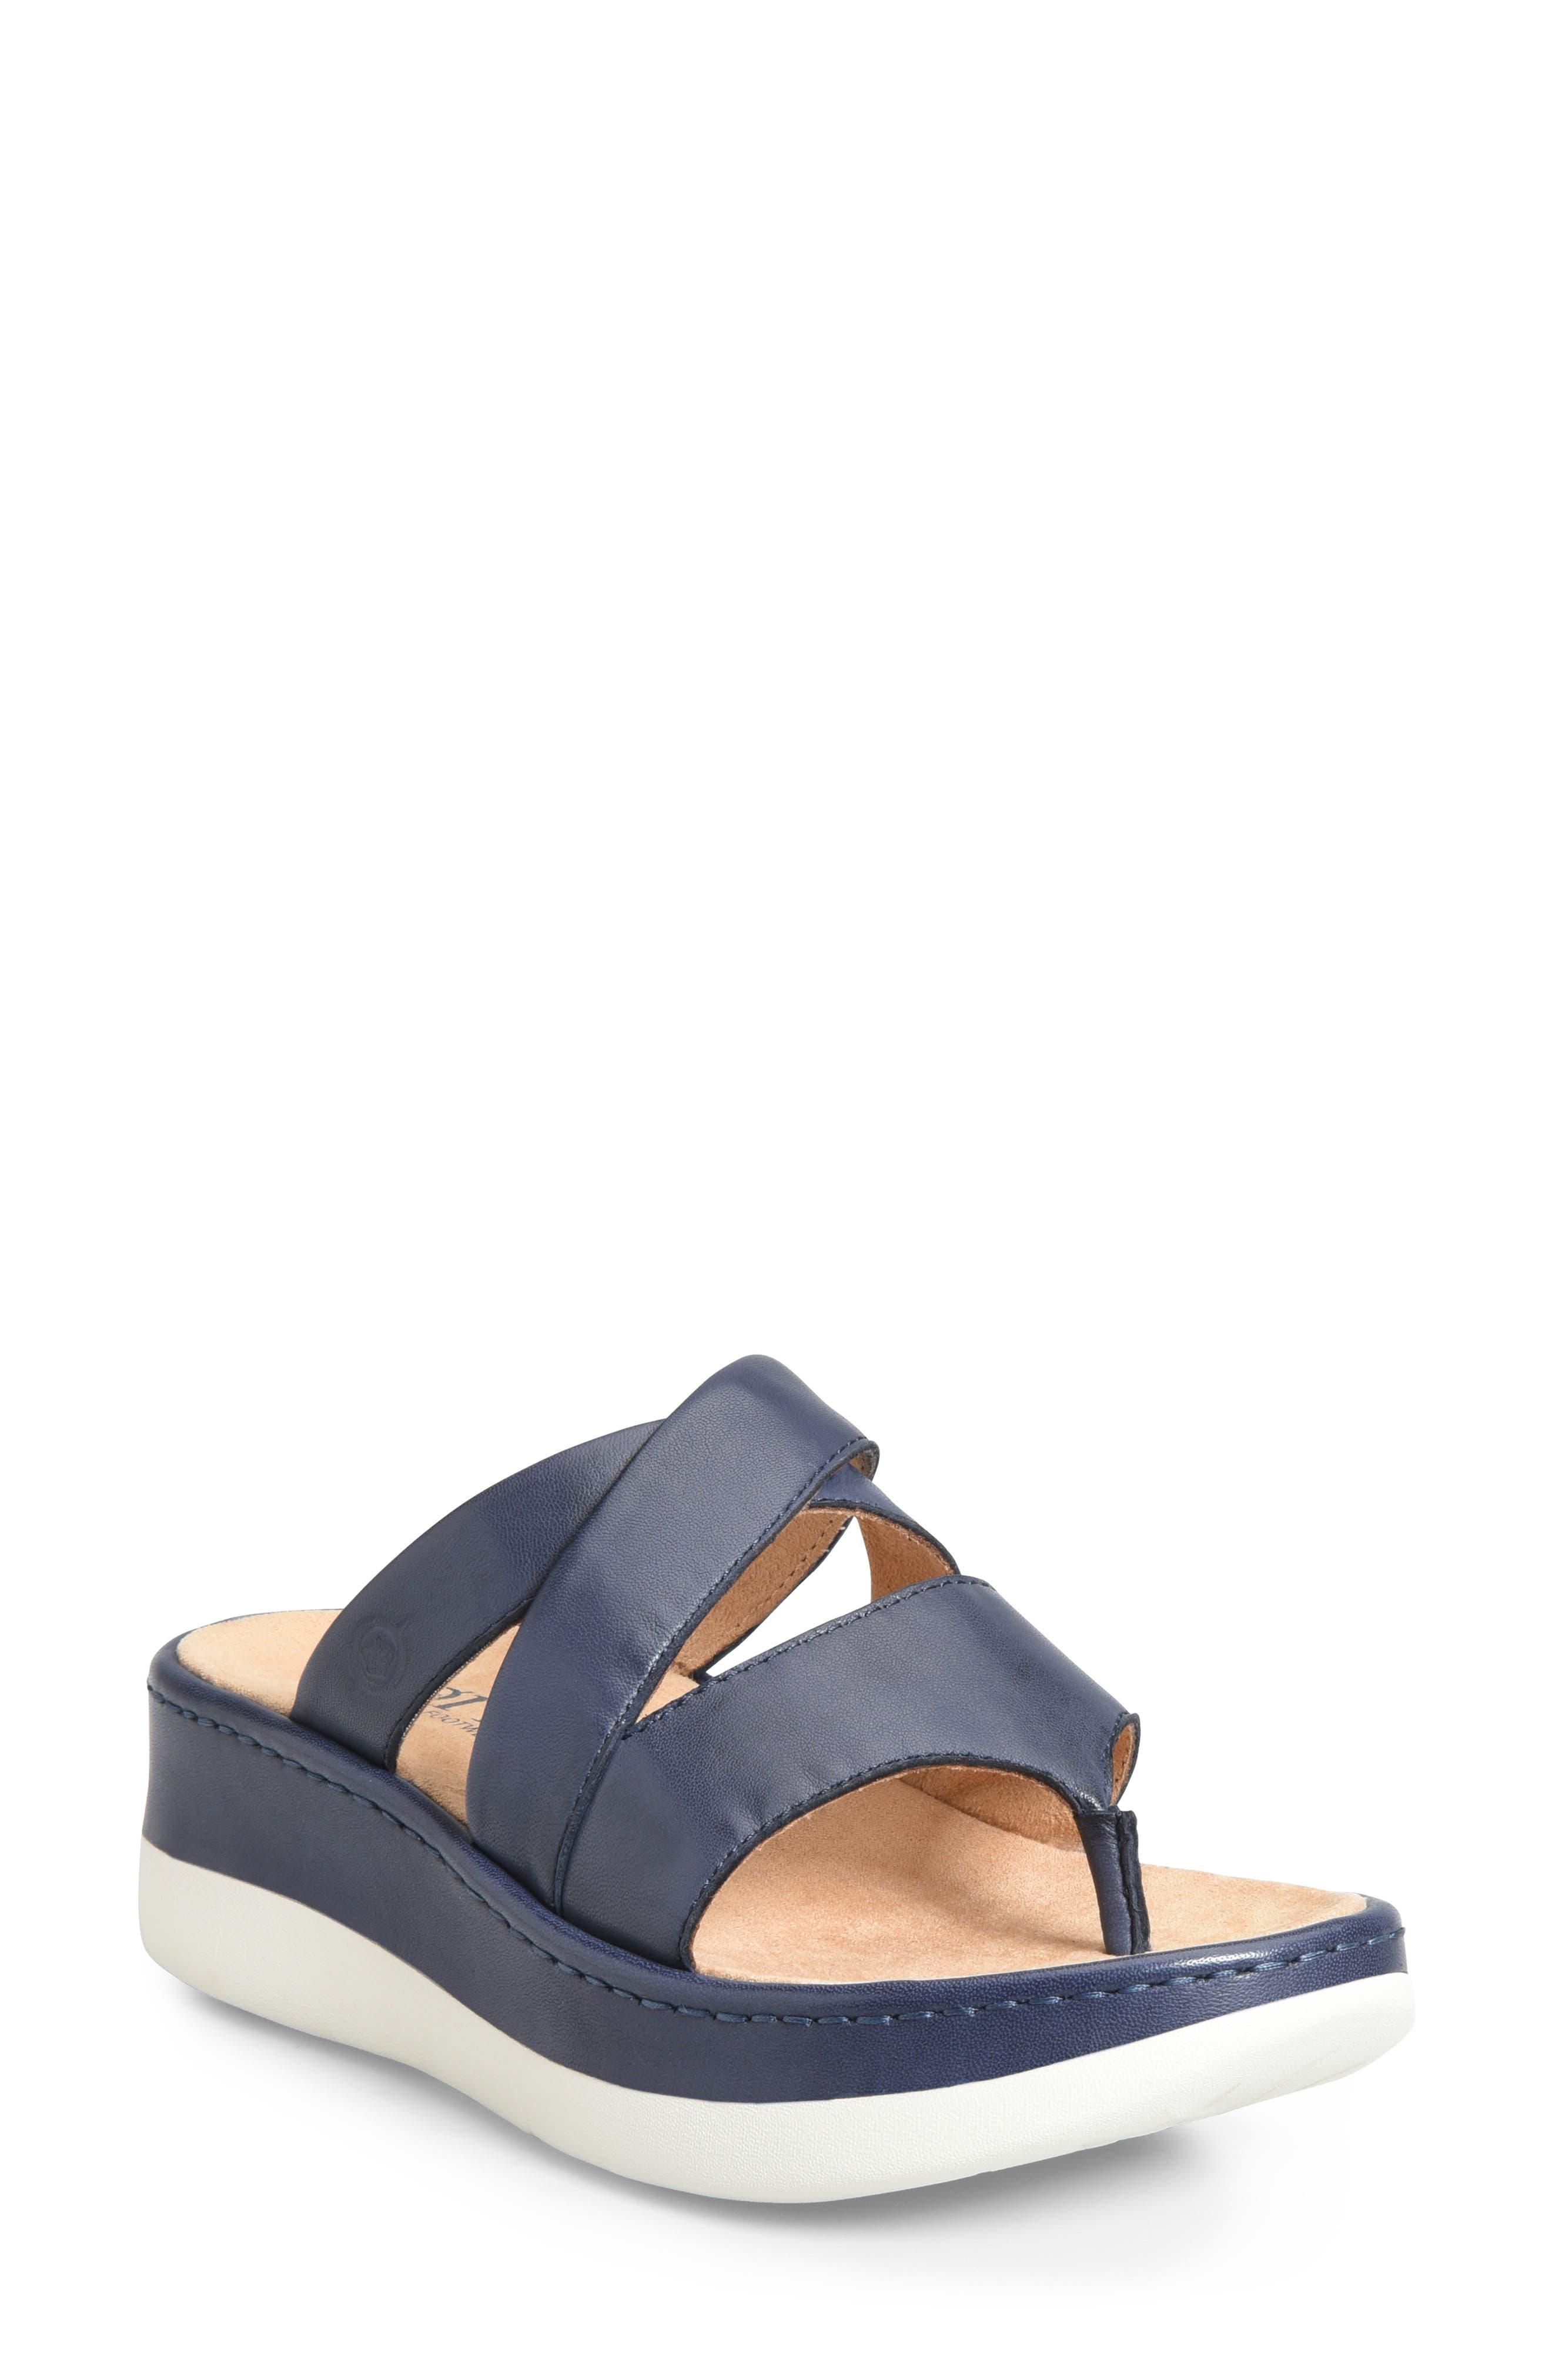 B?rn Unita Slide Sandal, Blue